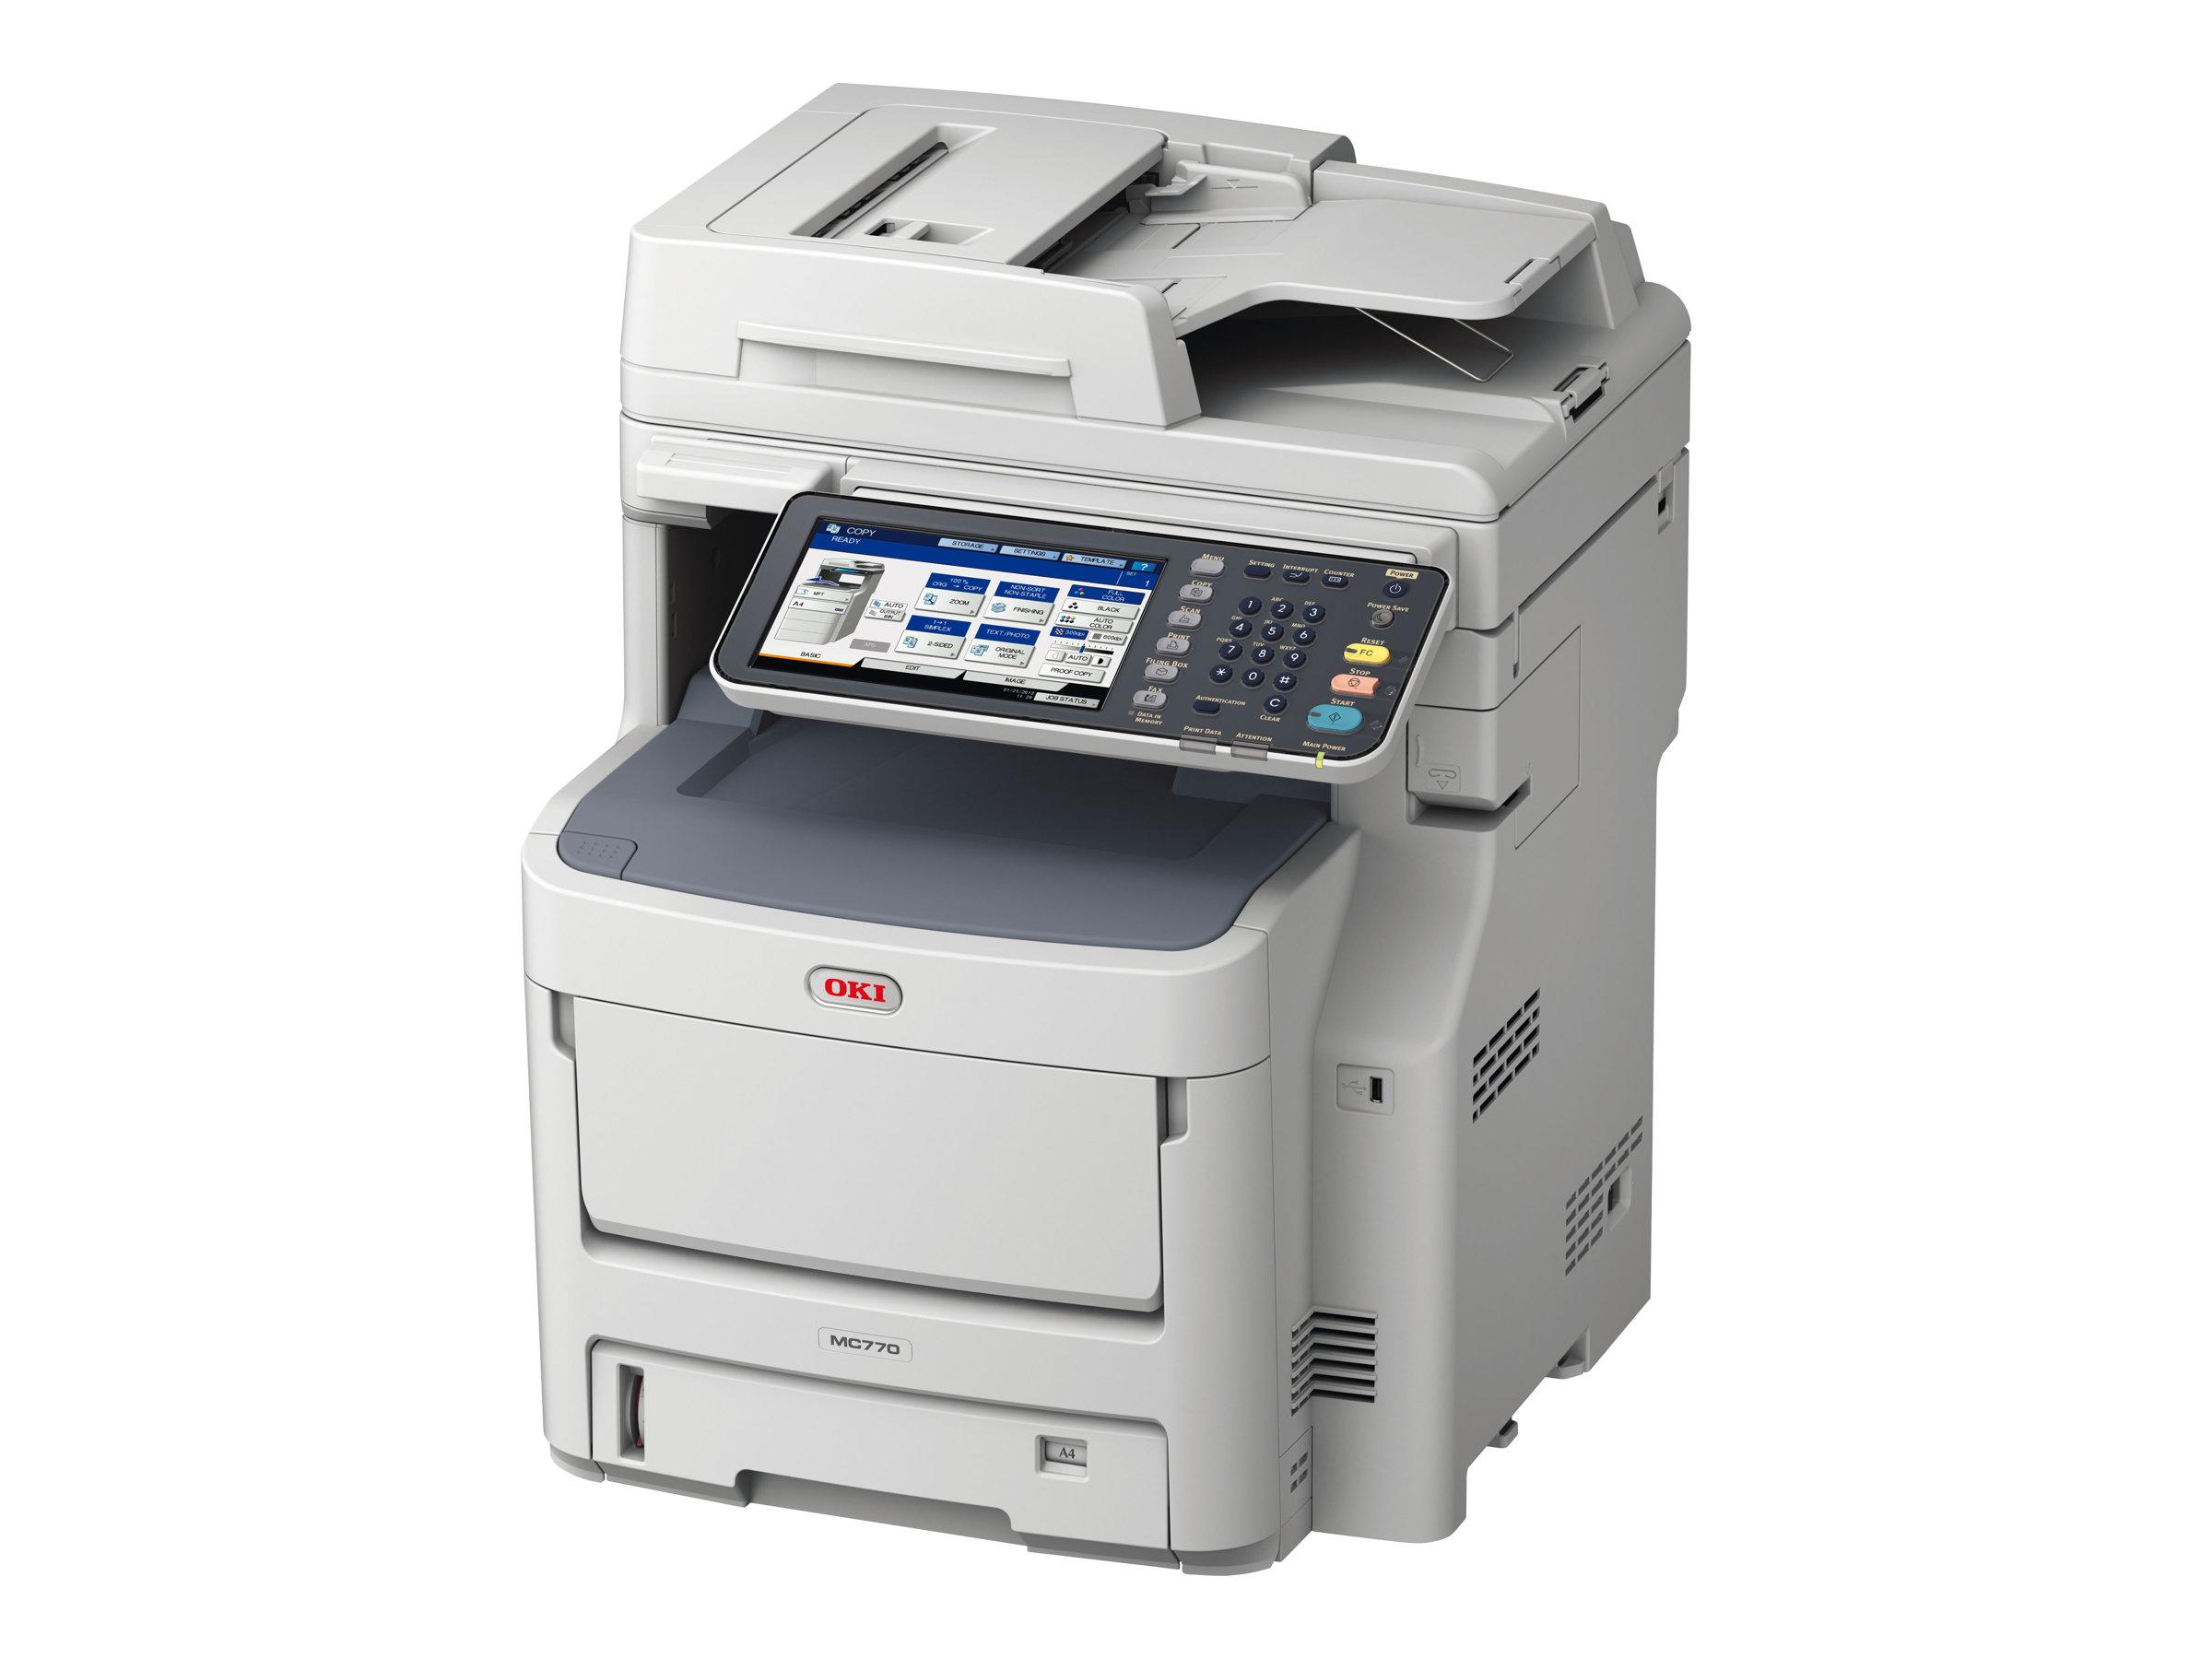 OKI MC770dnfax - Multifunktionsdrucker - Farbe - LED - A4 (210 x 297 mm) (Original) - A4 (Medien)